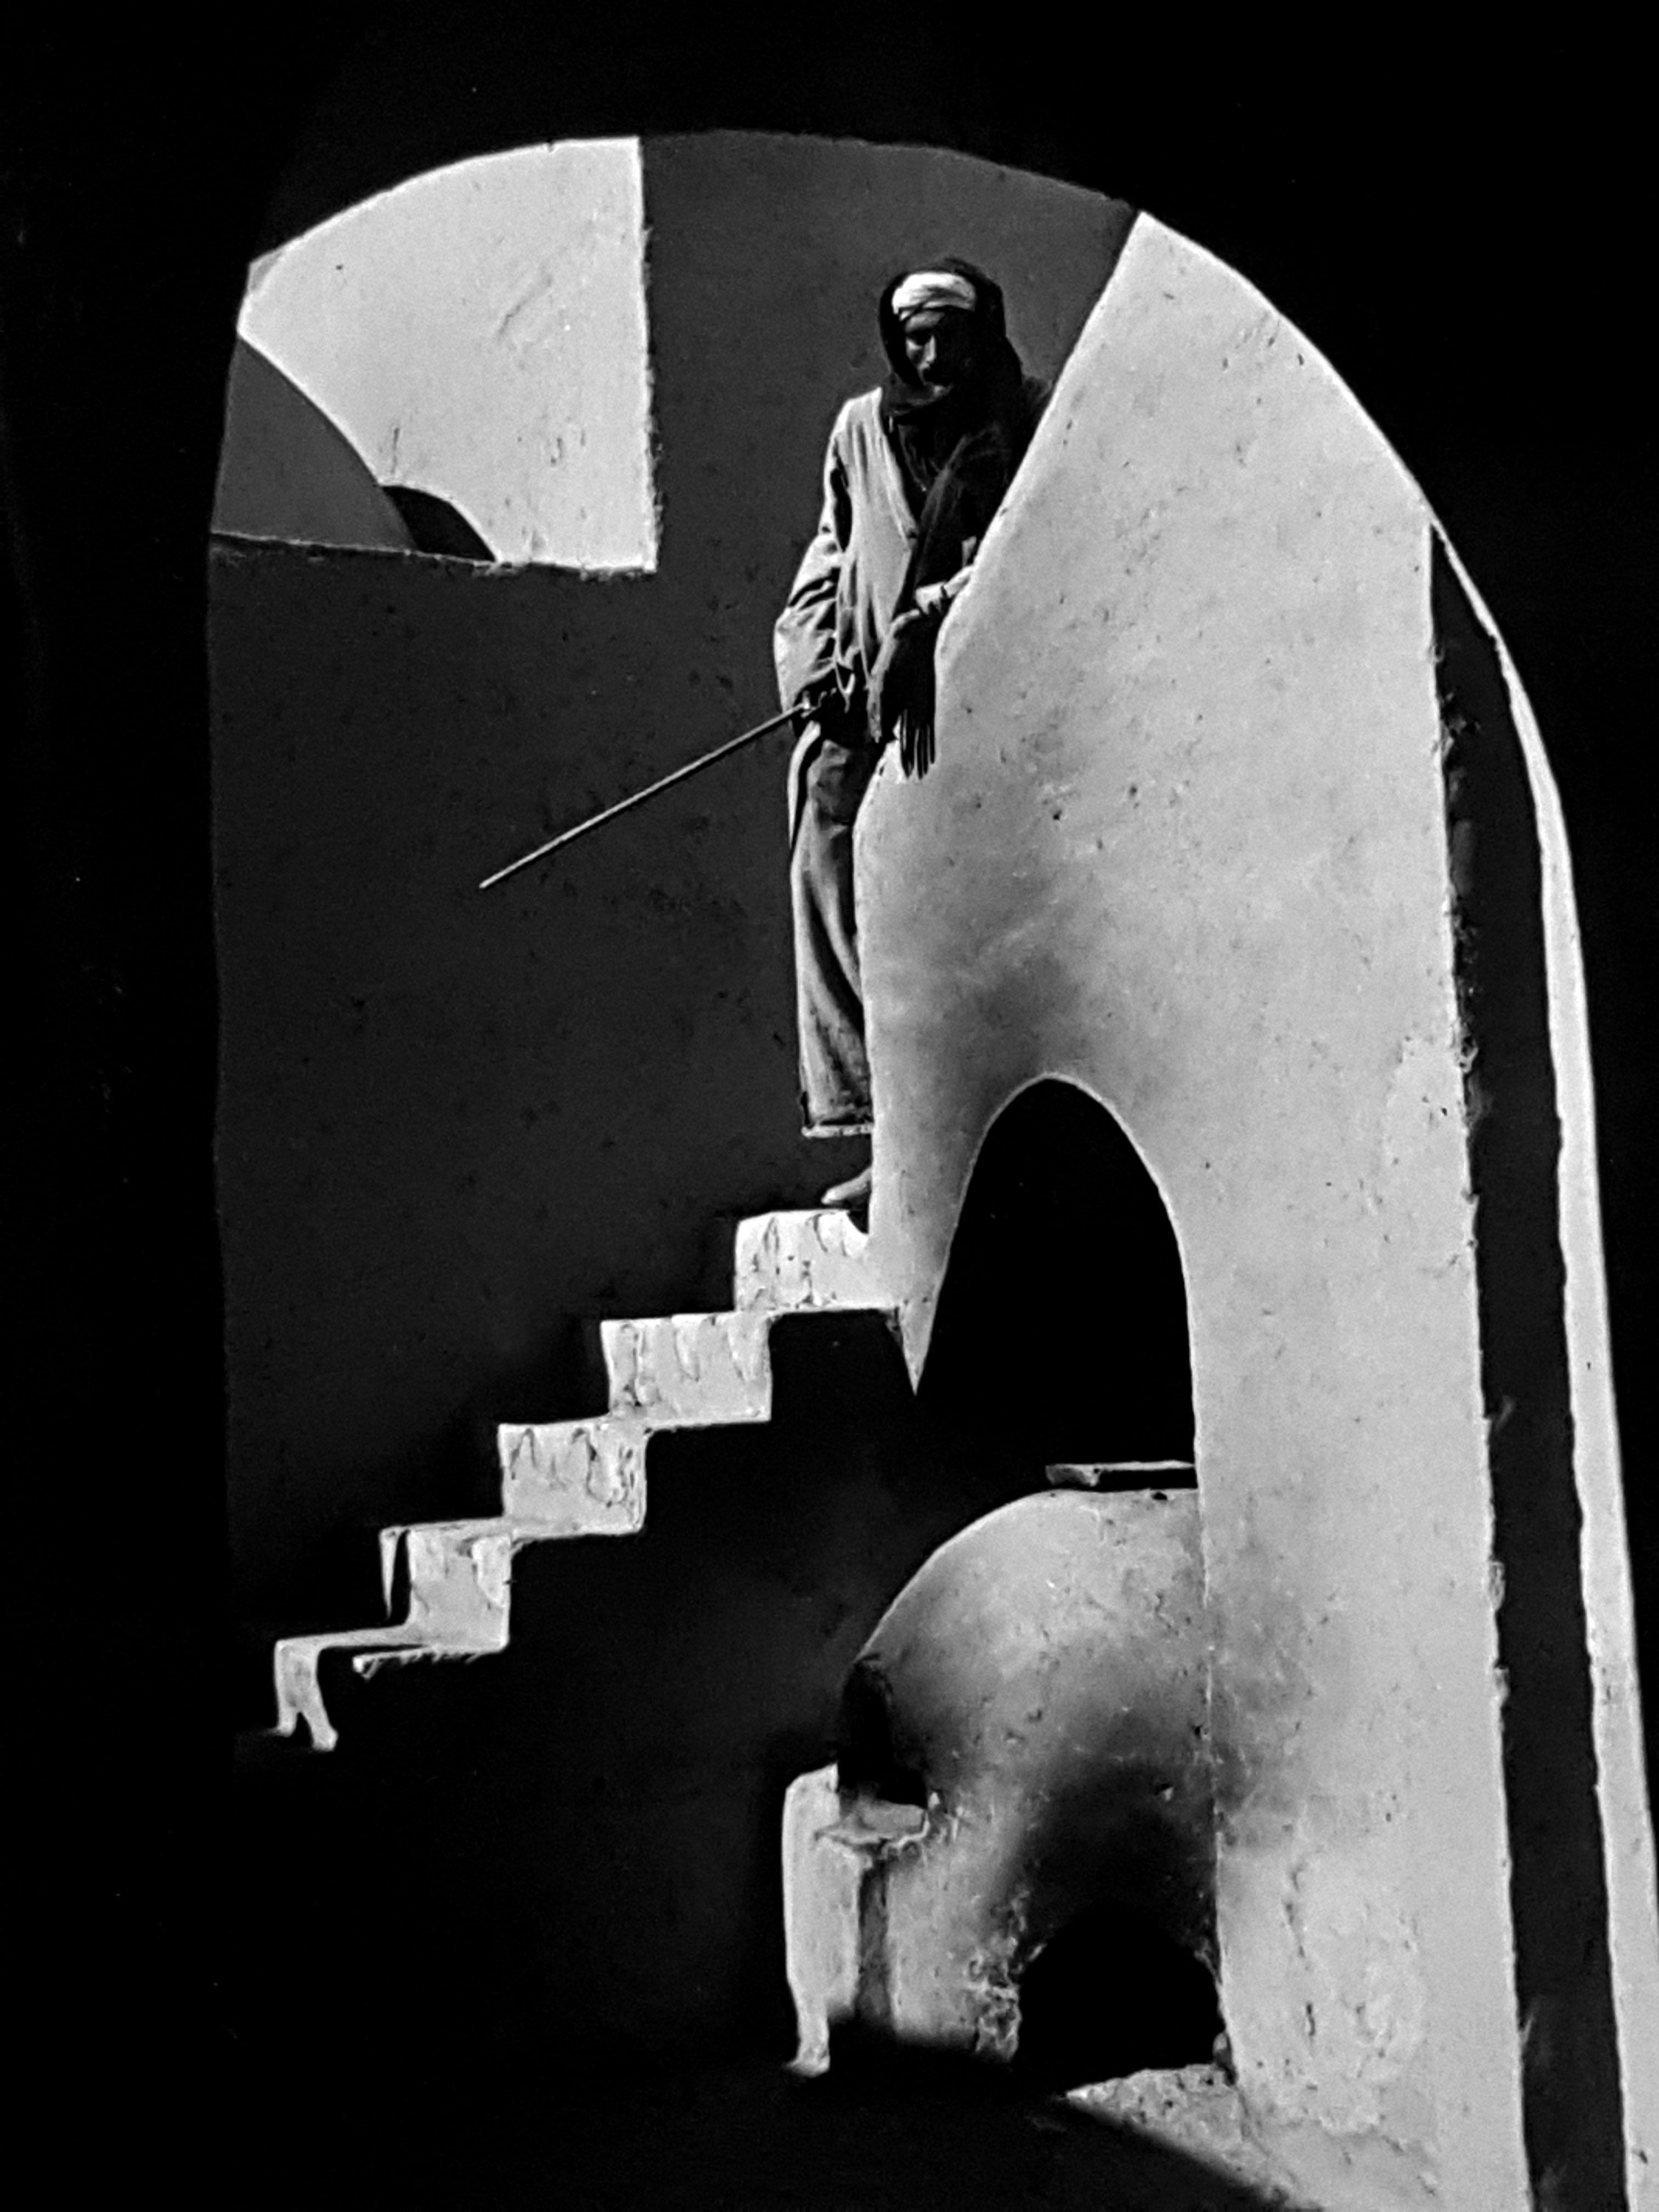 Henri Cartier-Bresson, Égypte, 1950. | Photography | Pinterest ...